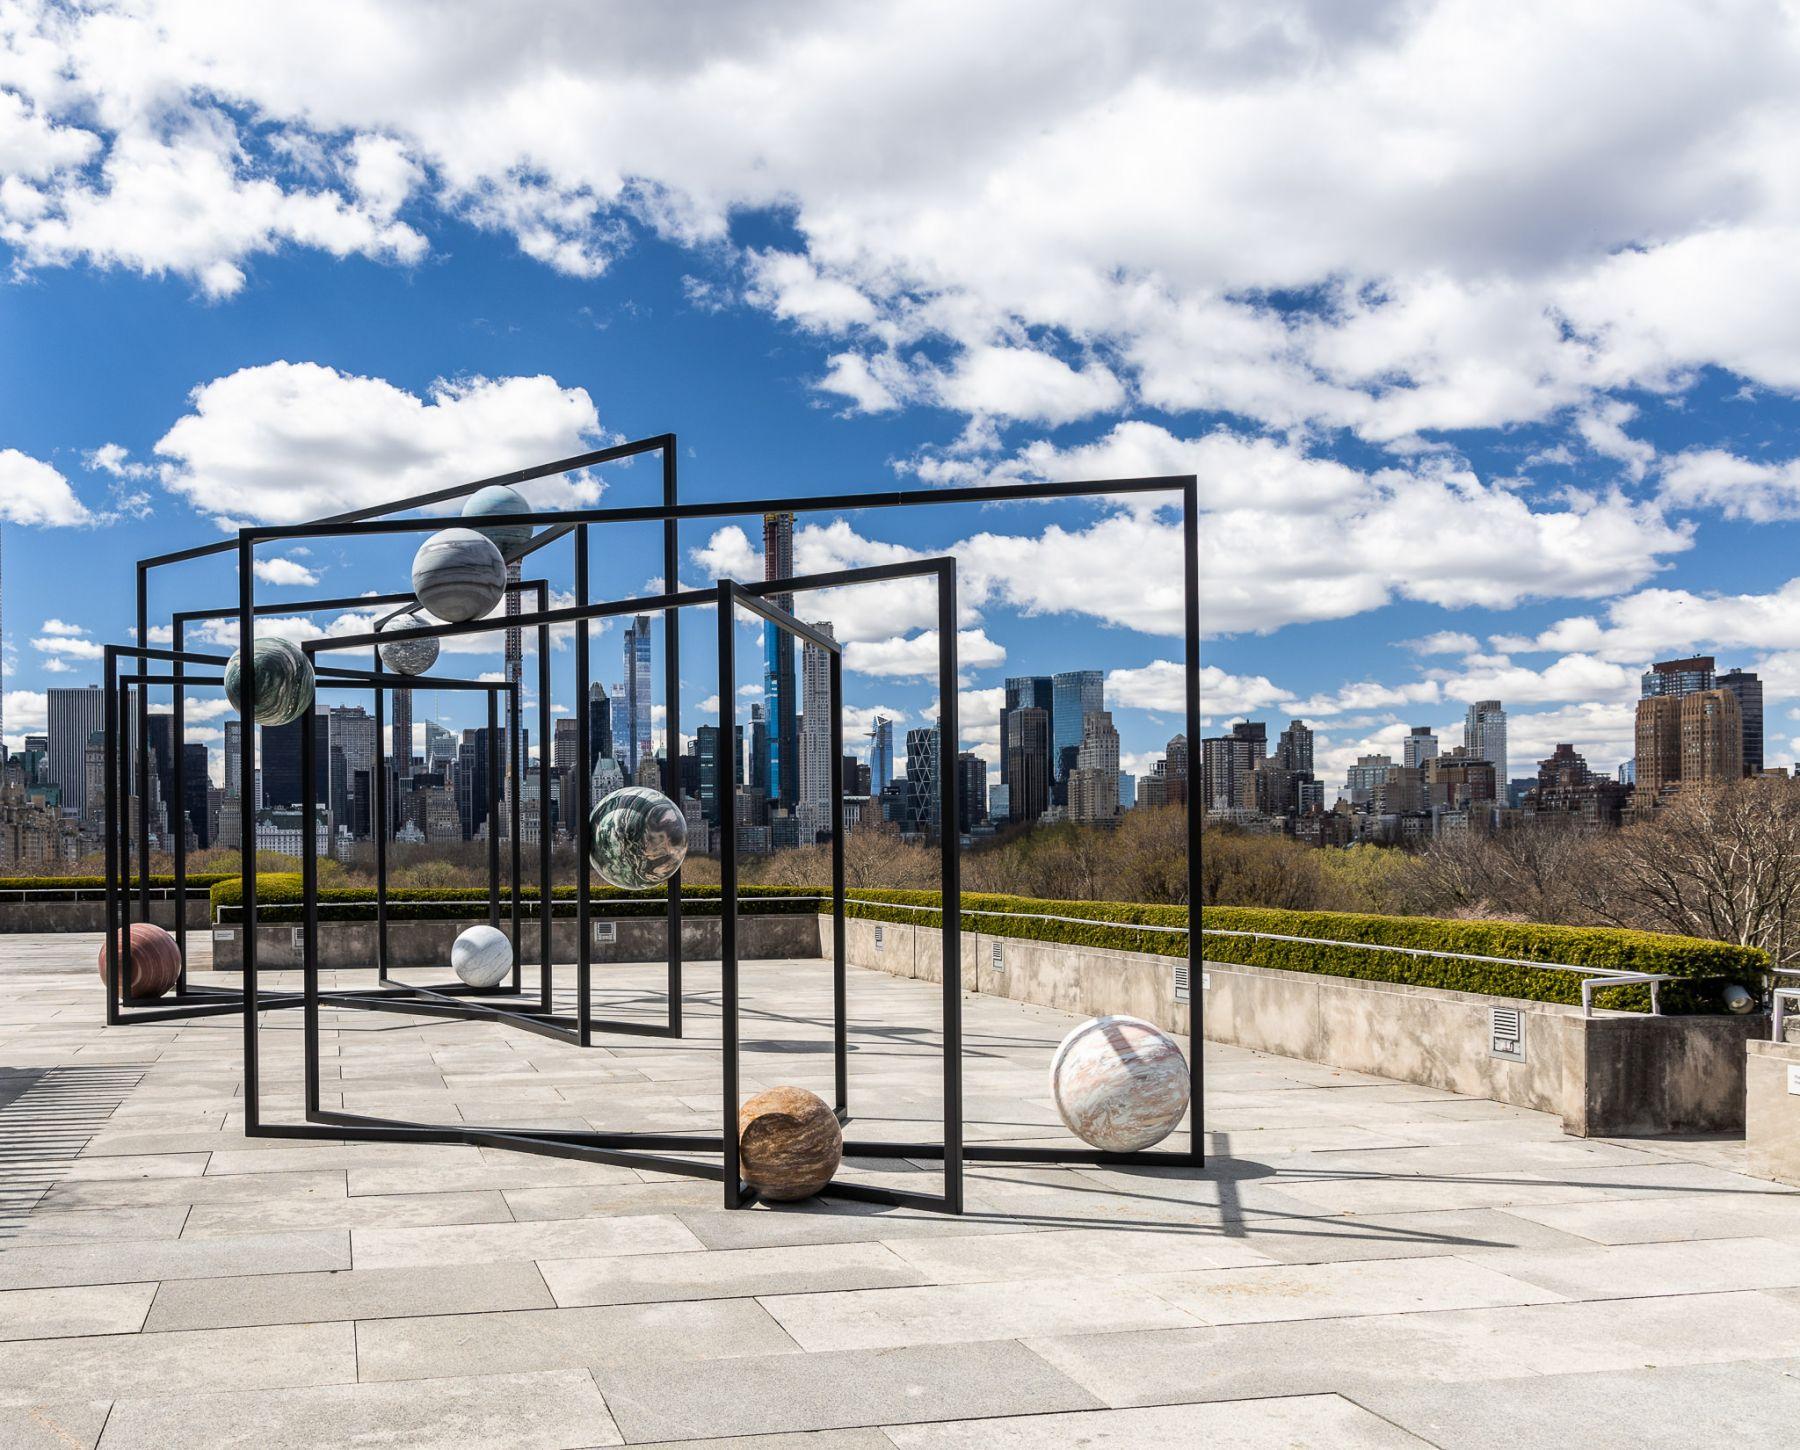 Installation view: Alicja Kwade, ParaPivot, 2019, © The Metropolitan Museum of Art, photo by Hyla Skopitz